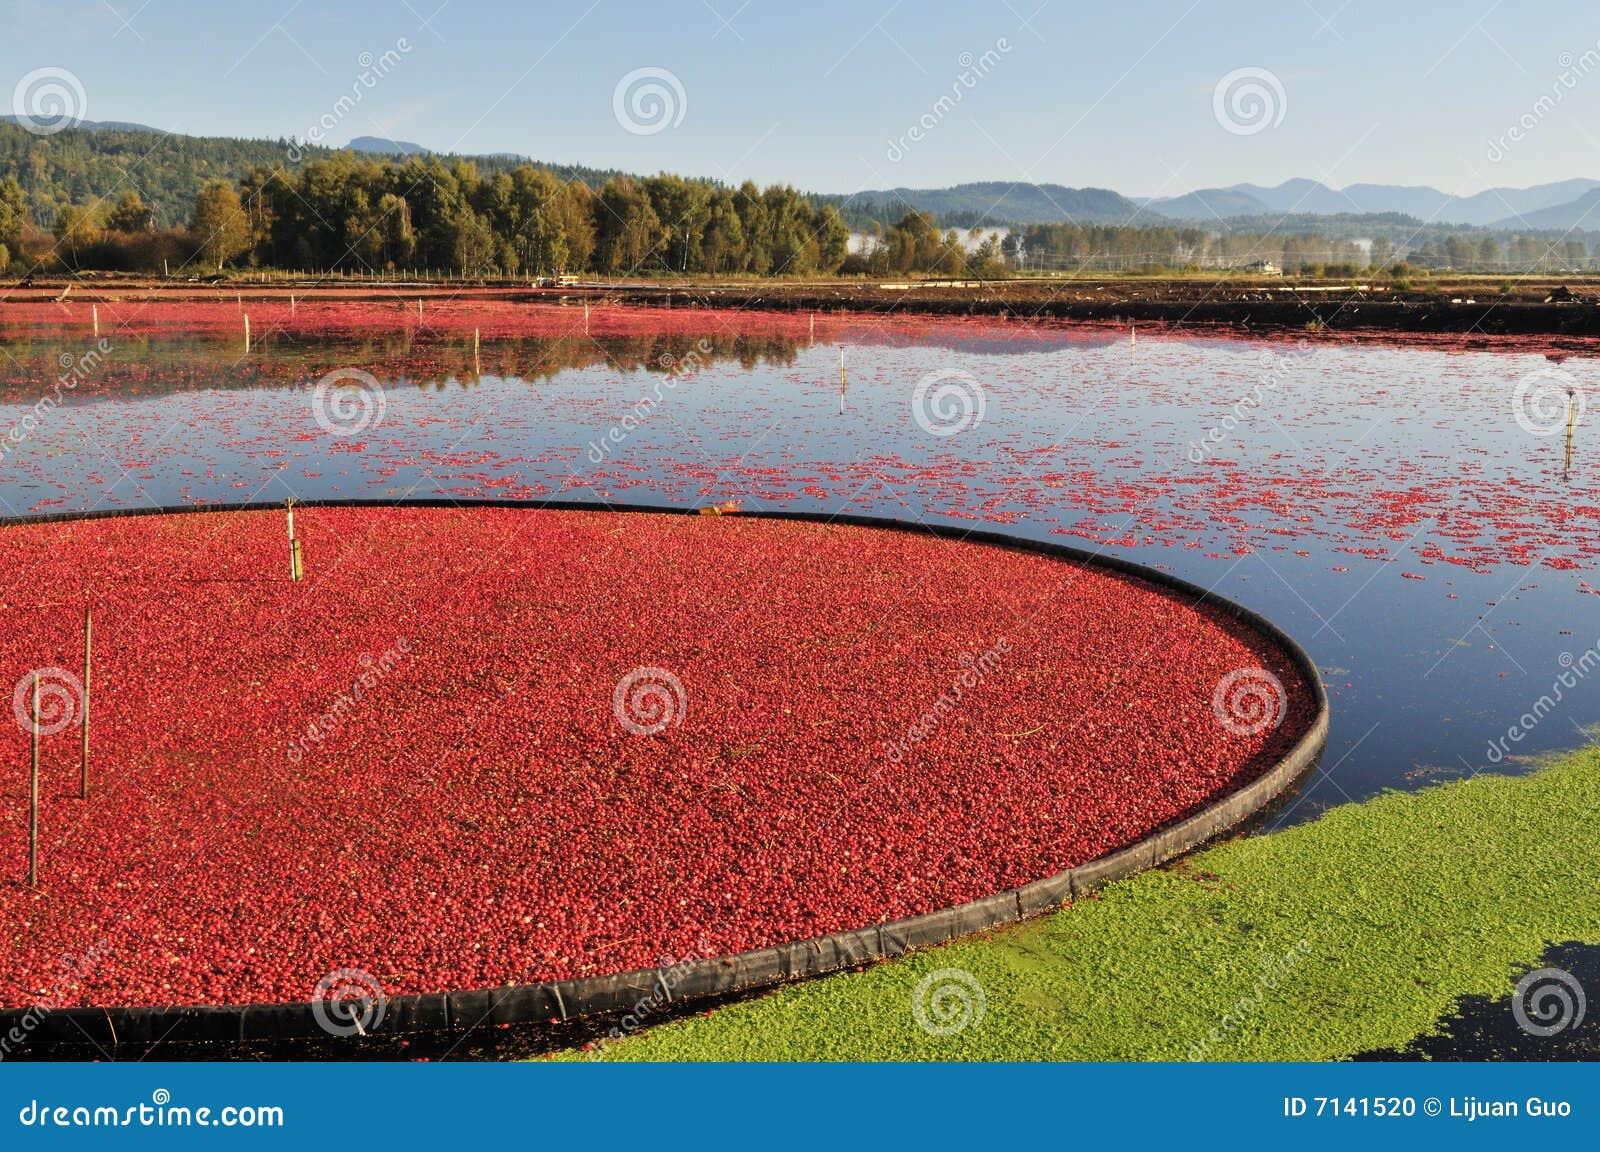 Cranberry Farming